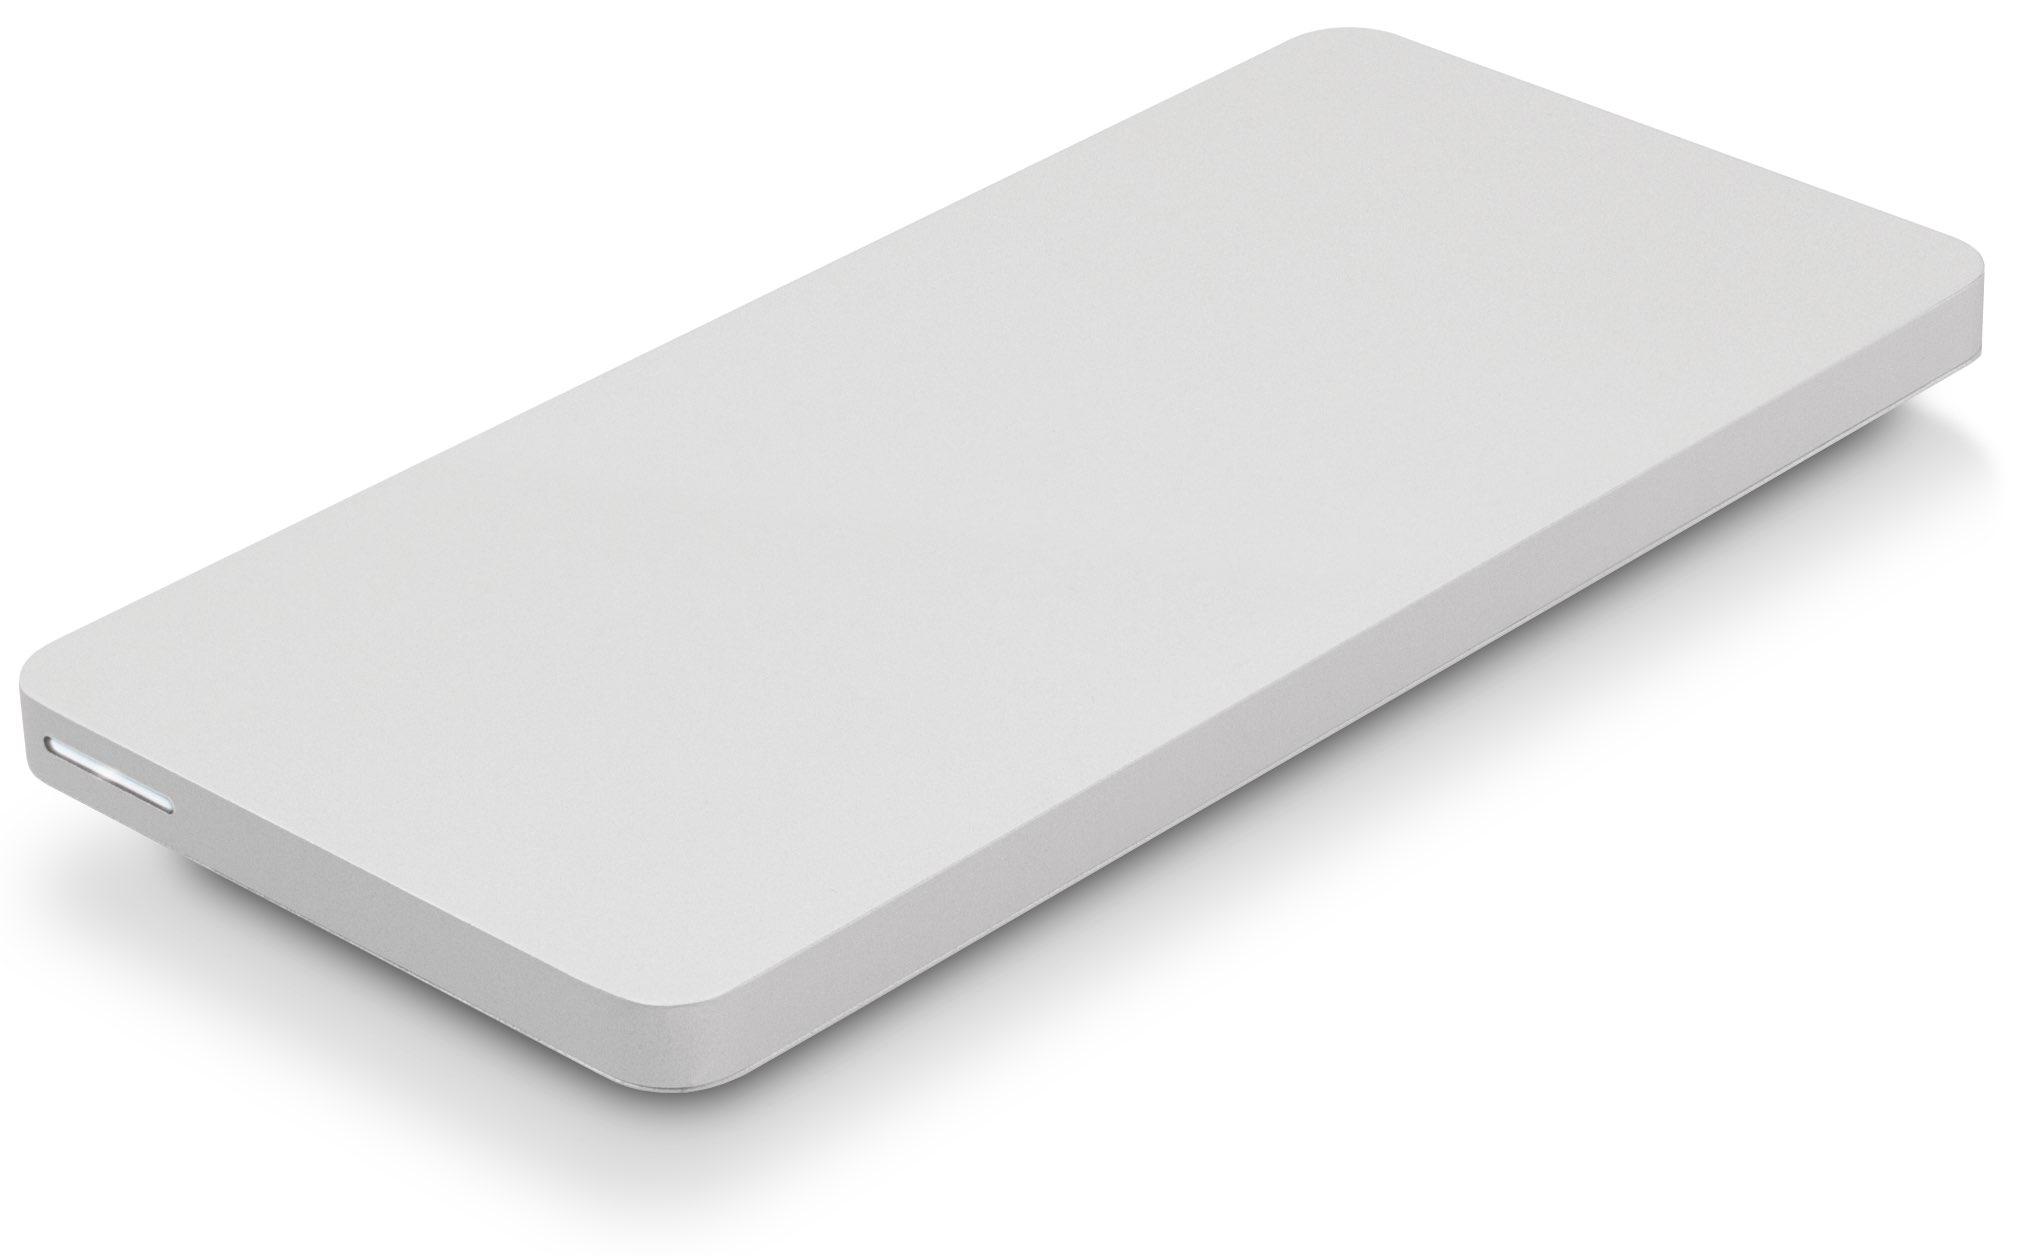 OWC's external USB-C SSD offers 2TB of storage, Thunderbolt